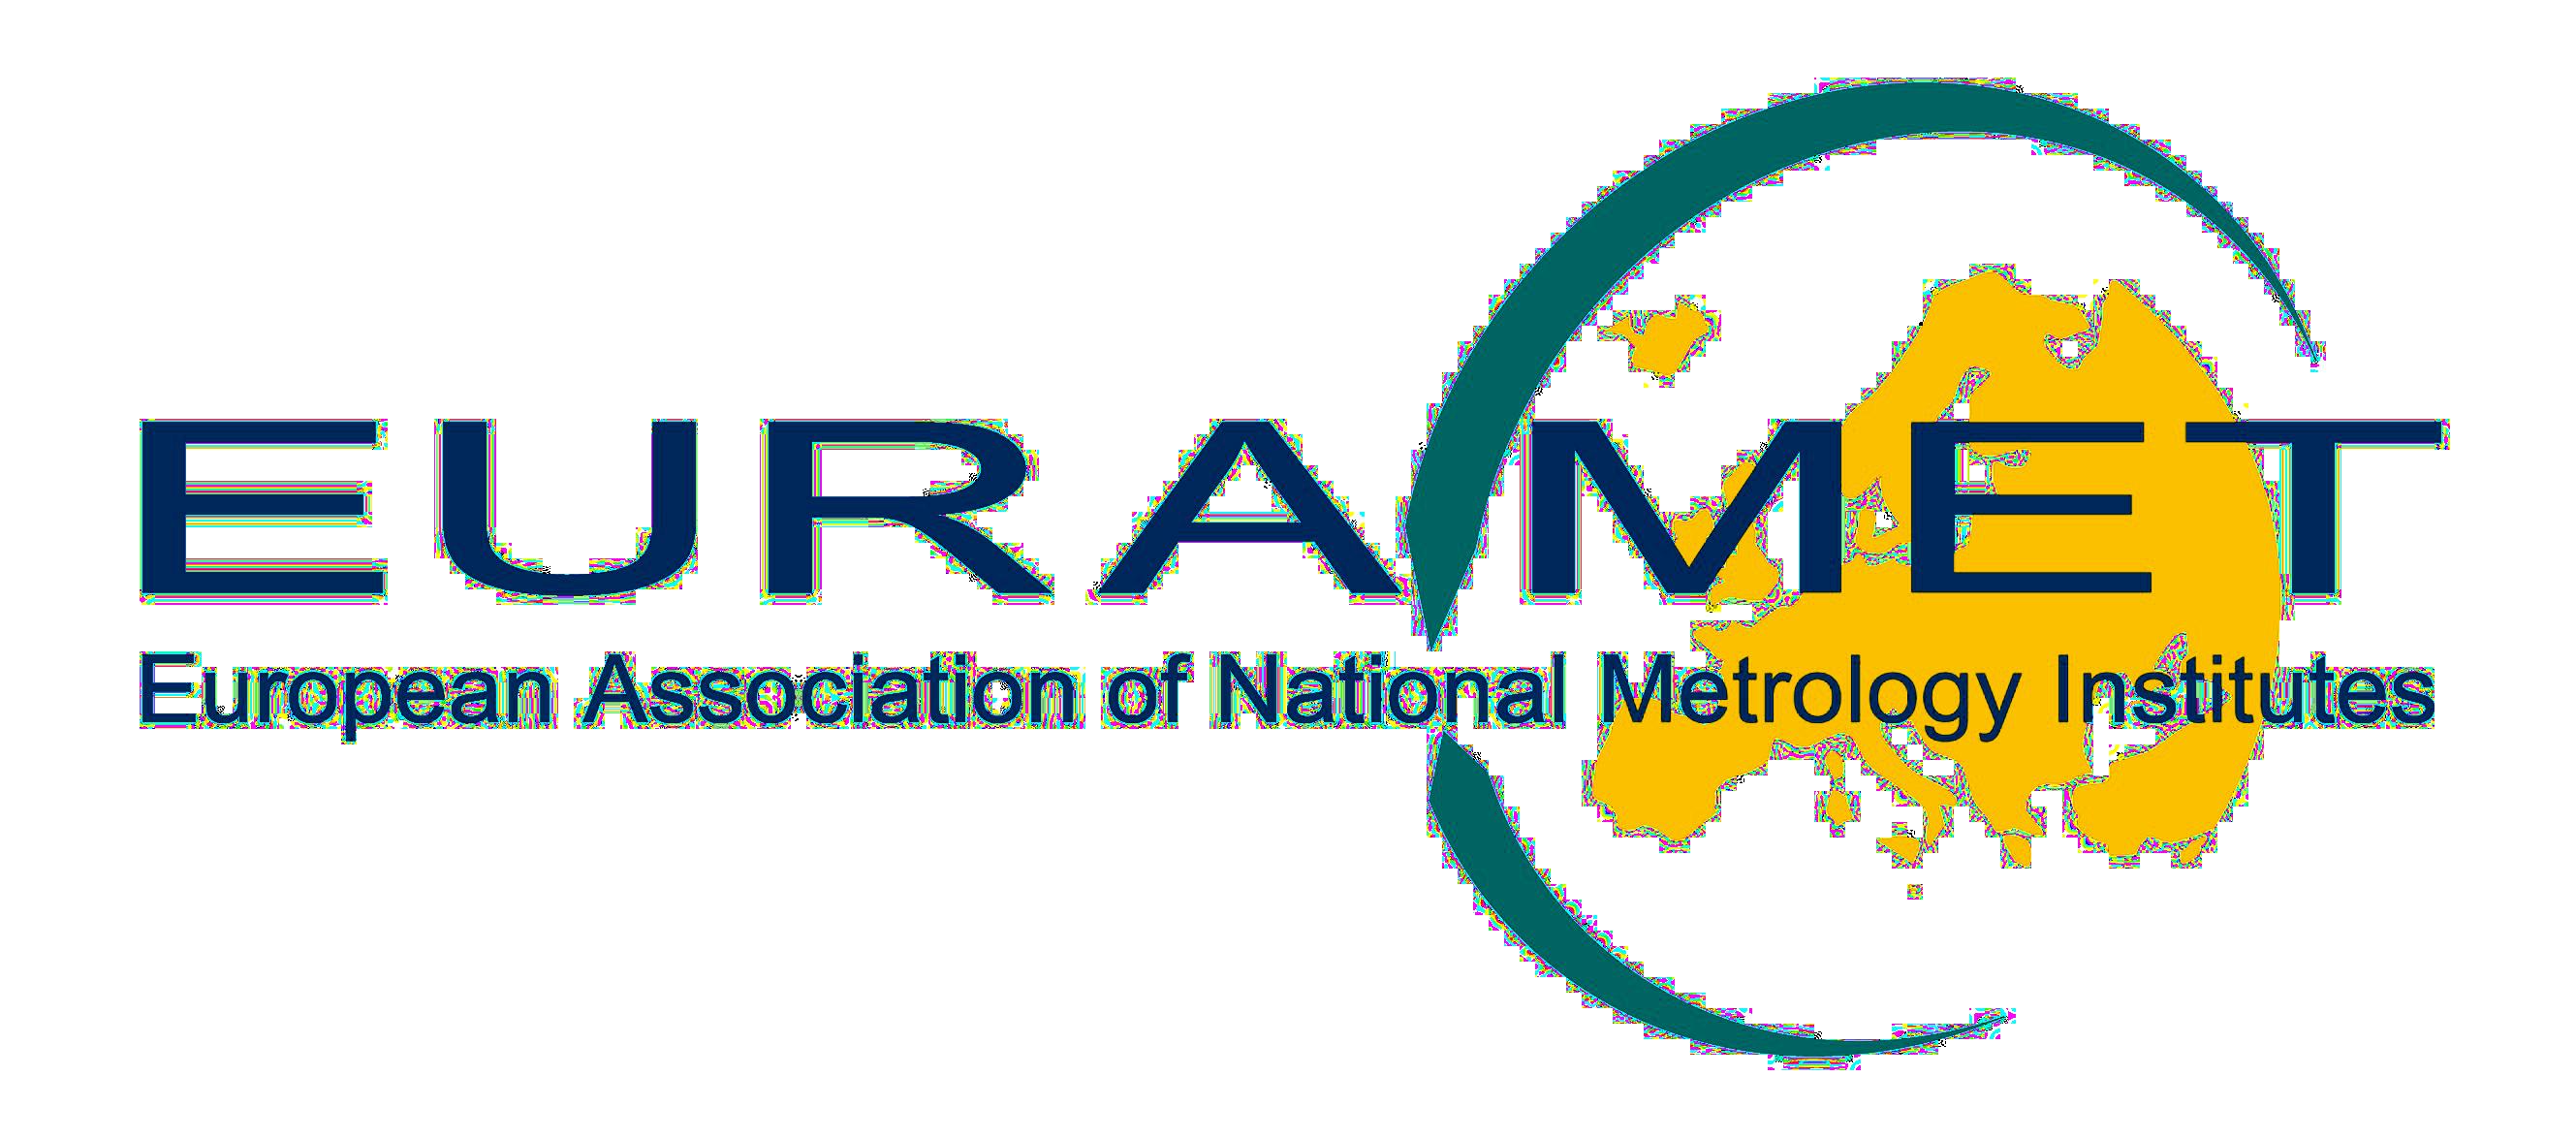 EURAMET - European Association of National Metrology Institutes